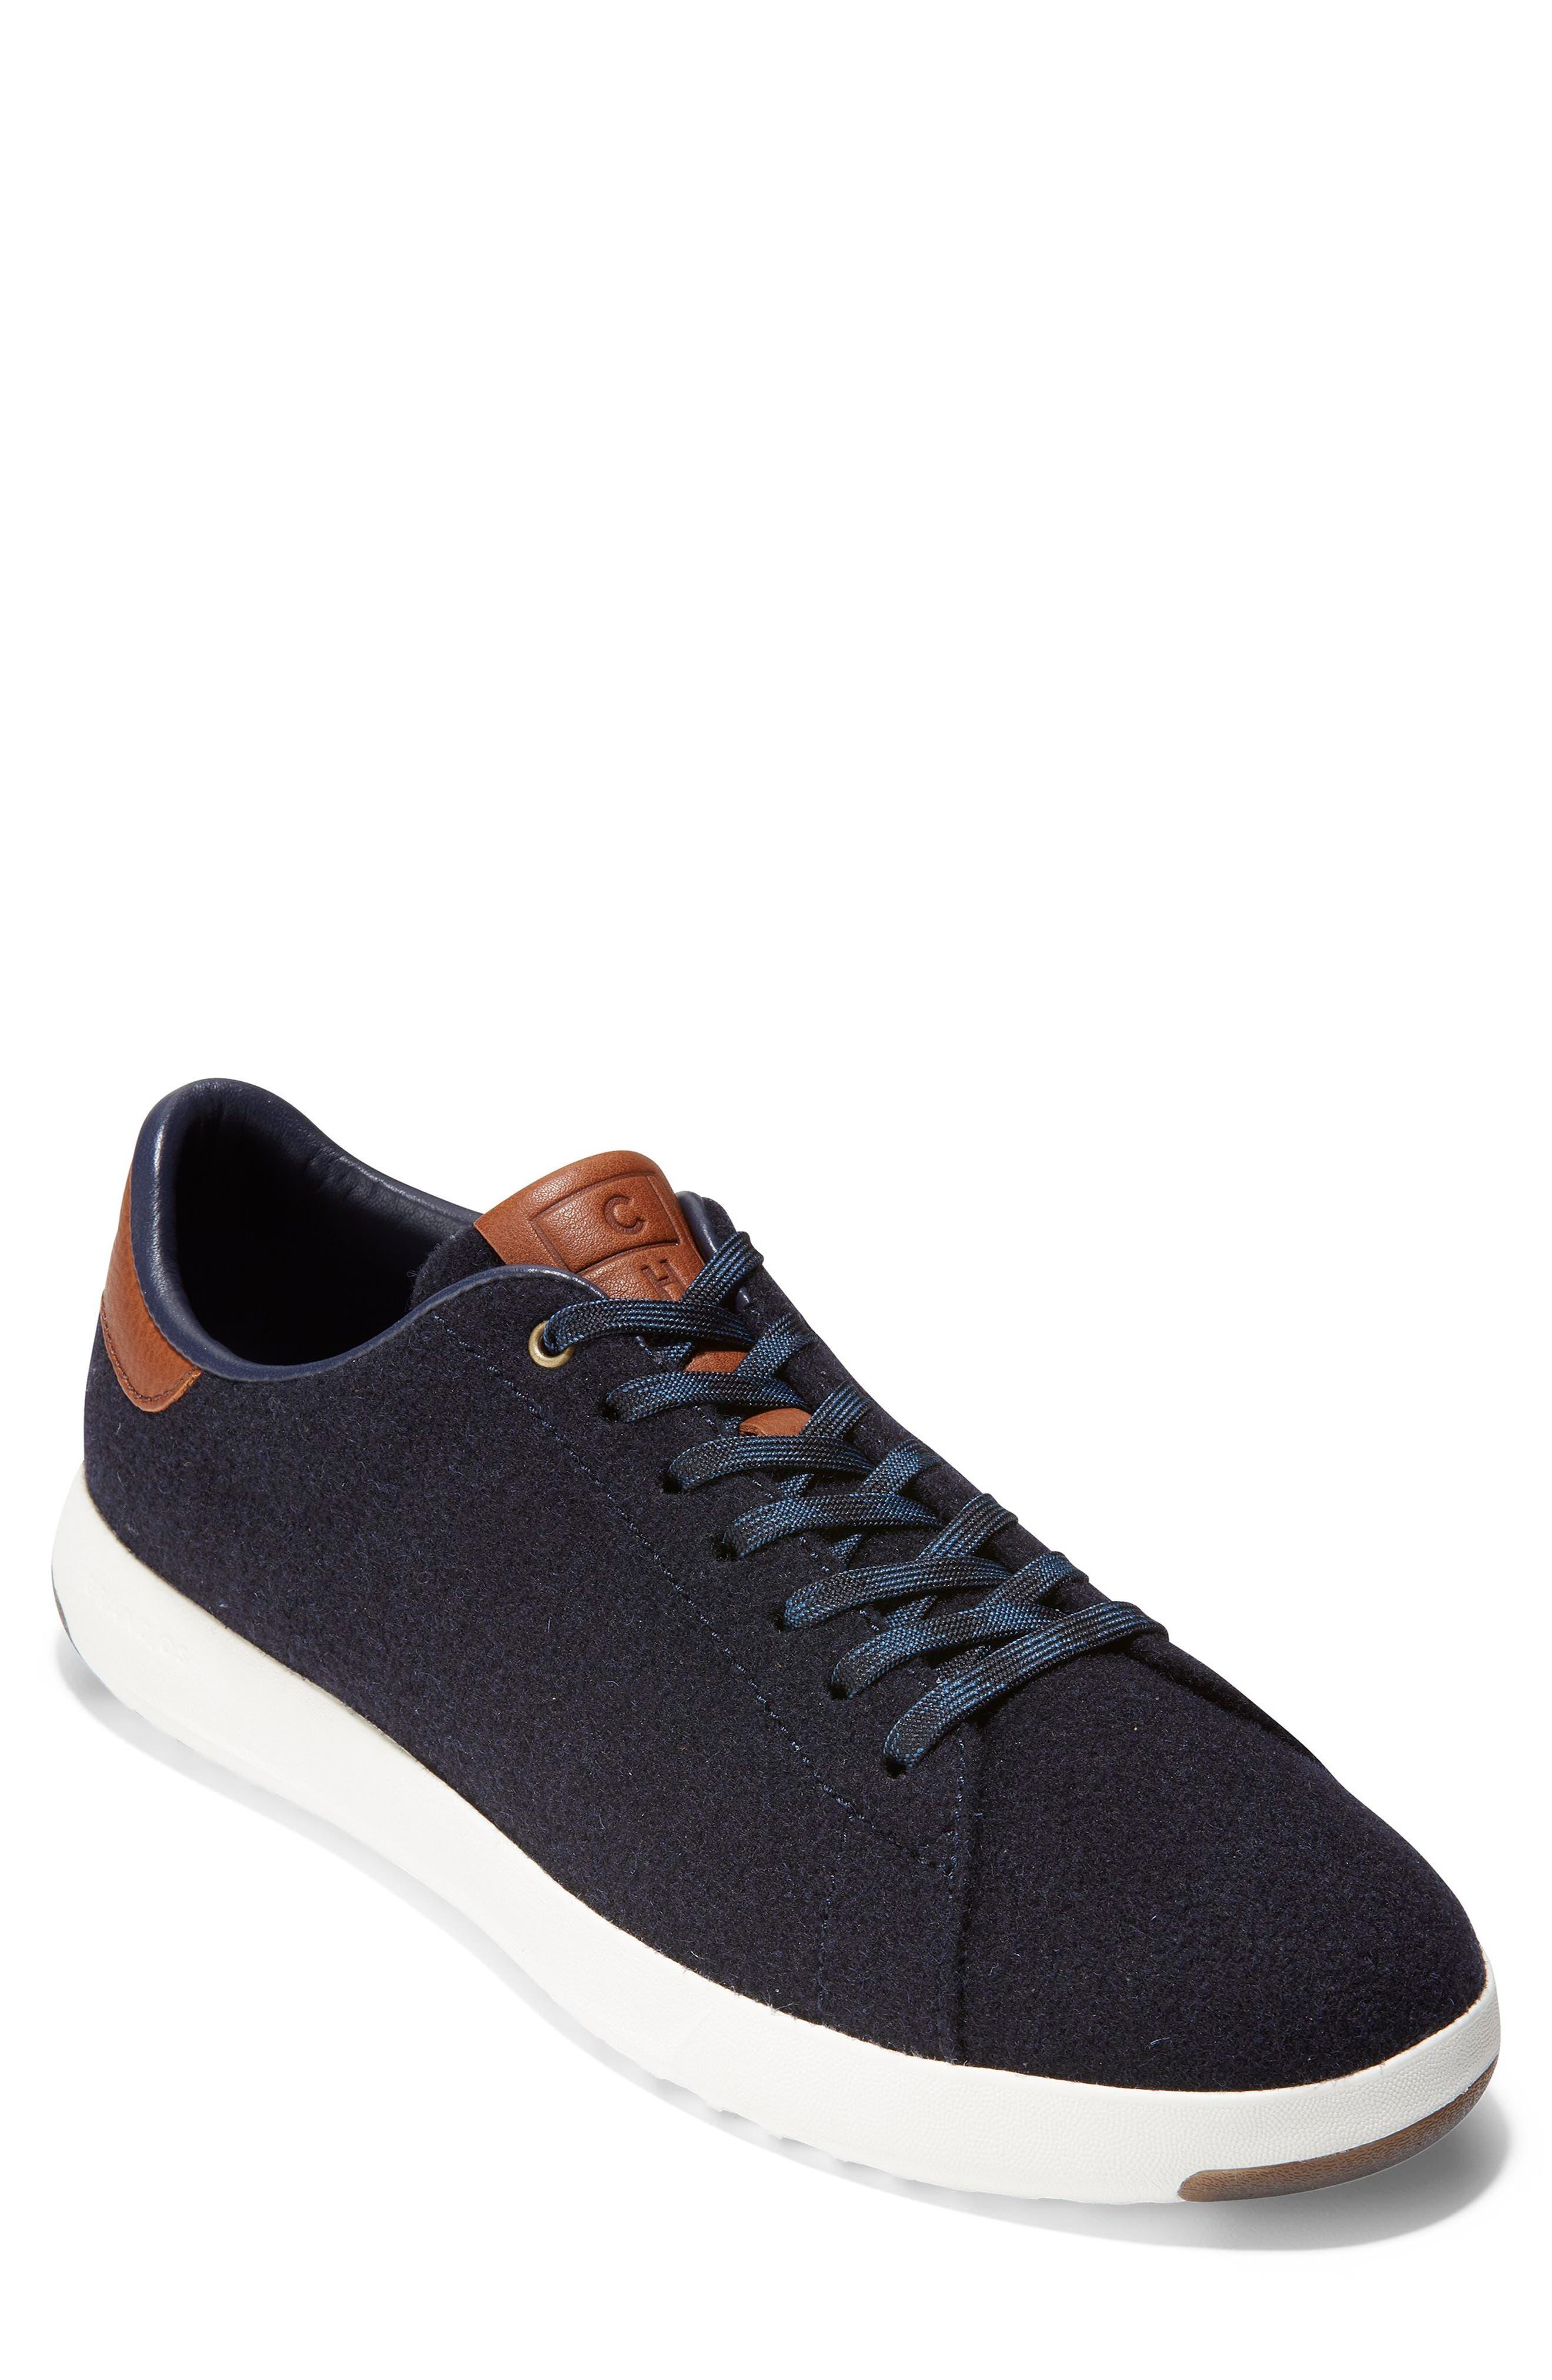 GrandPro Tennis Sneaker,                             Main thumbnail 1, color,                             NAVY INK WOOL/ BRITISH TAN